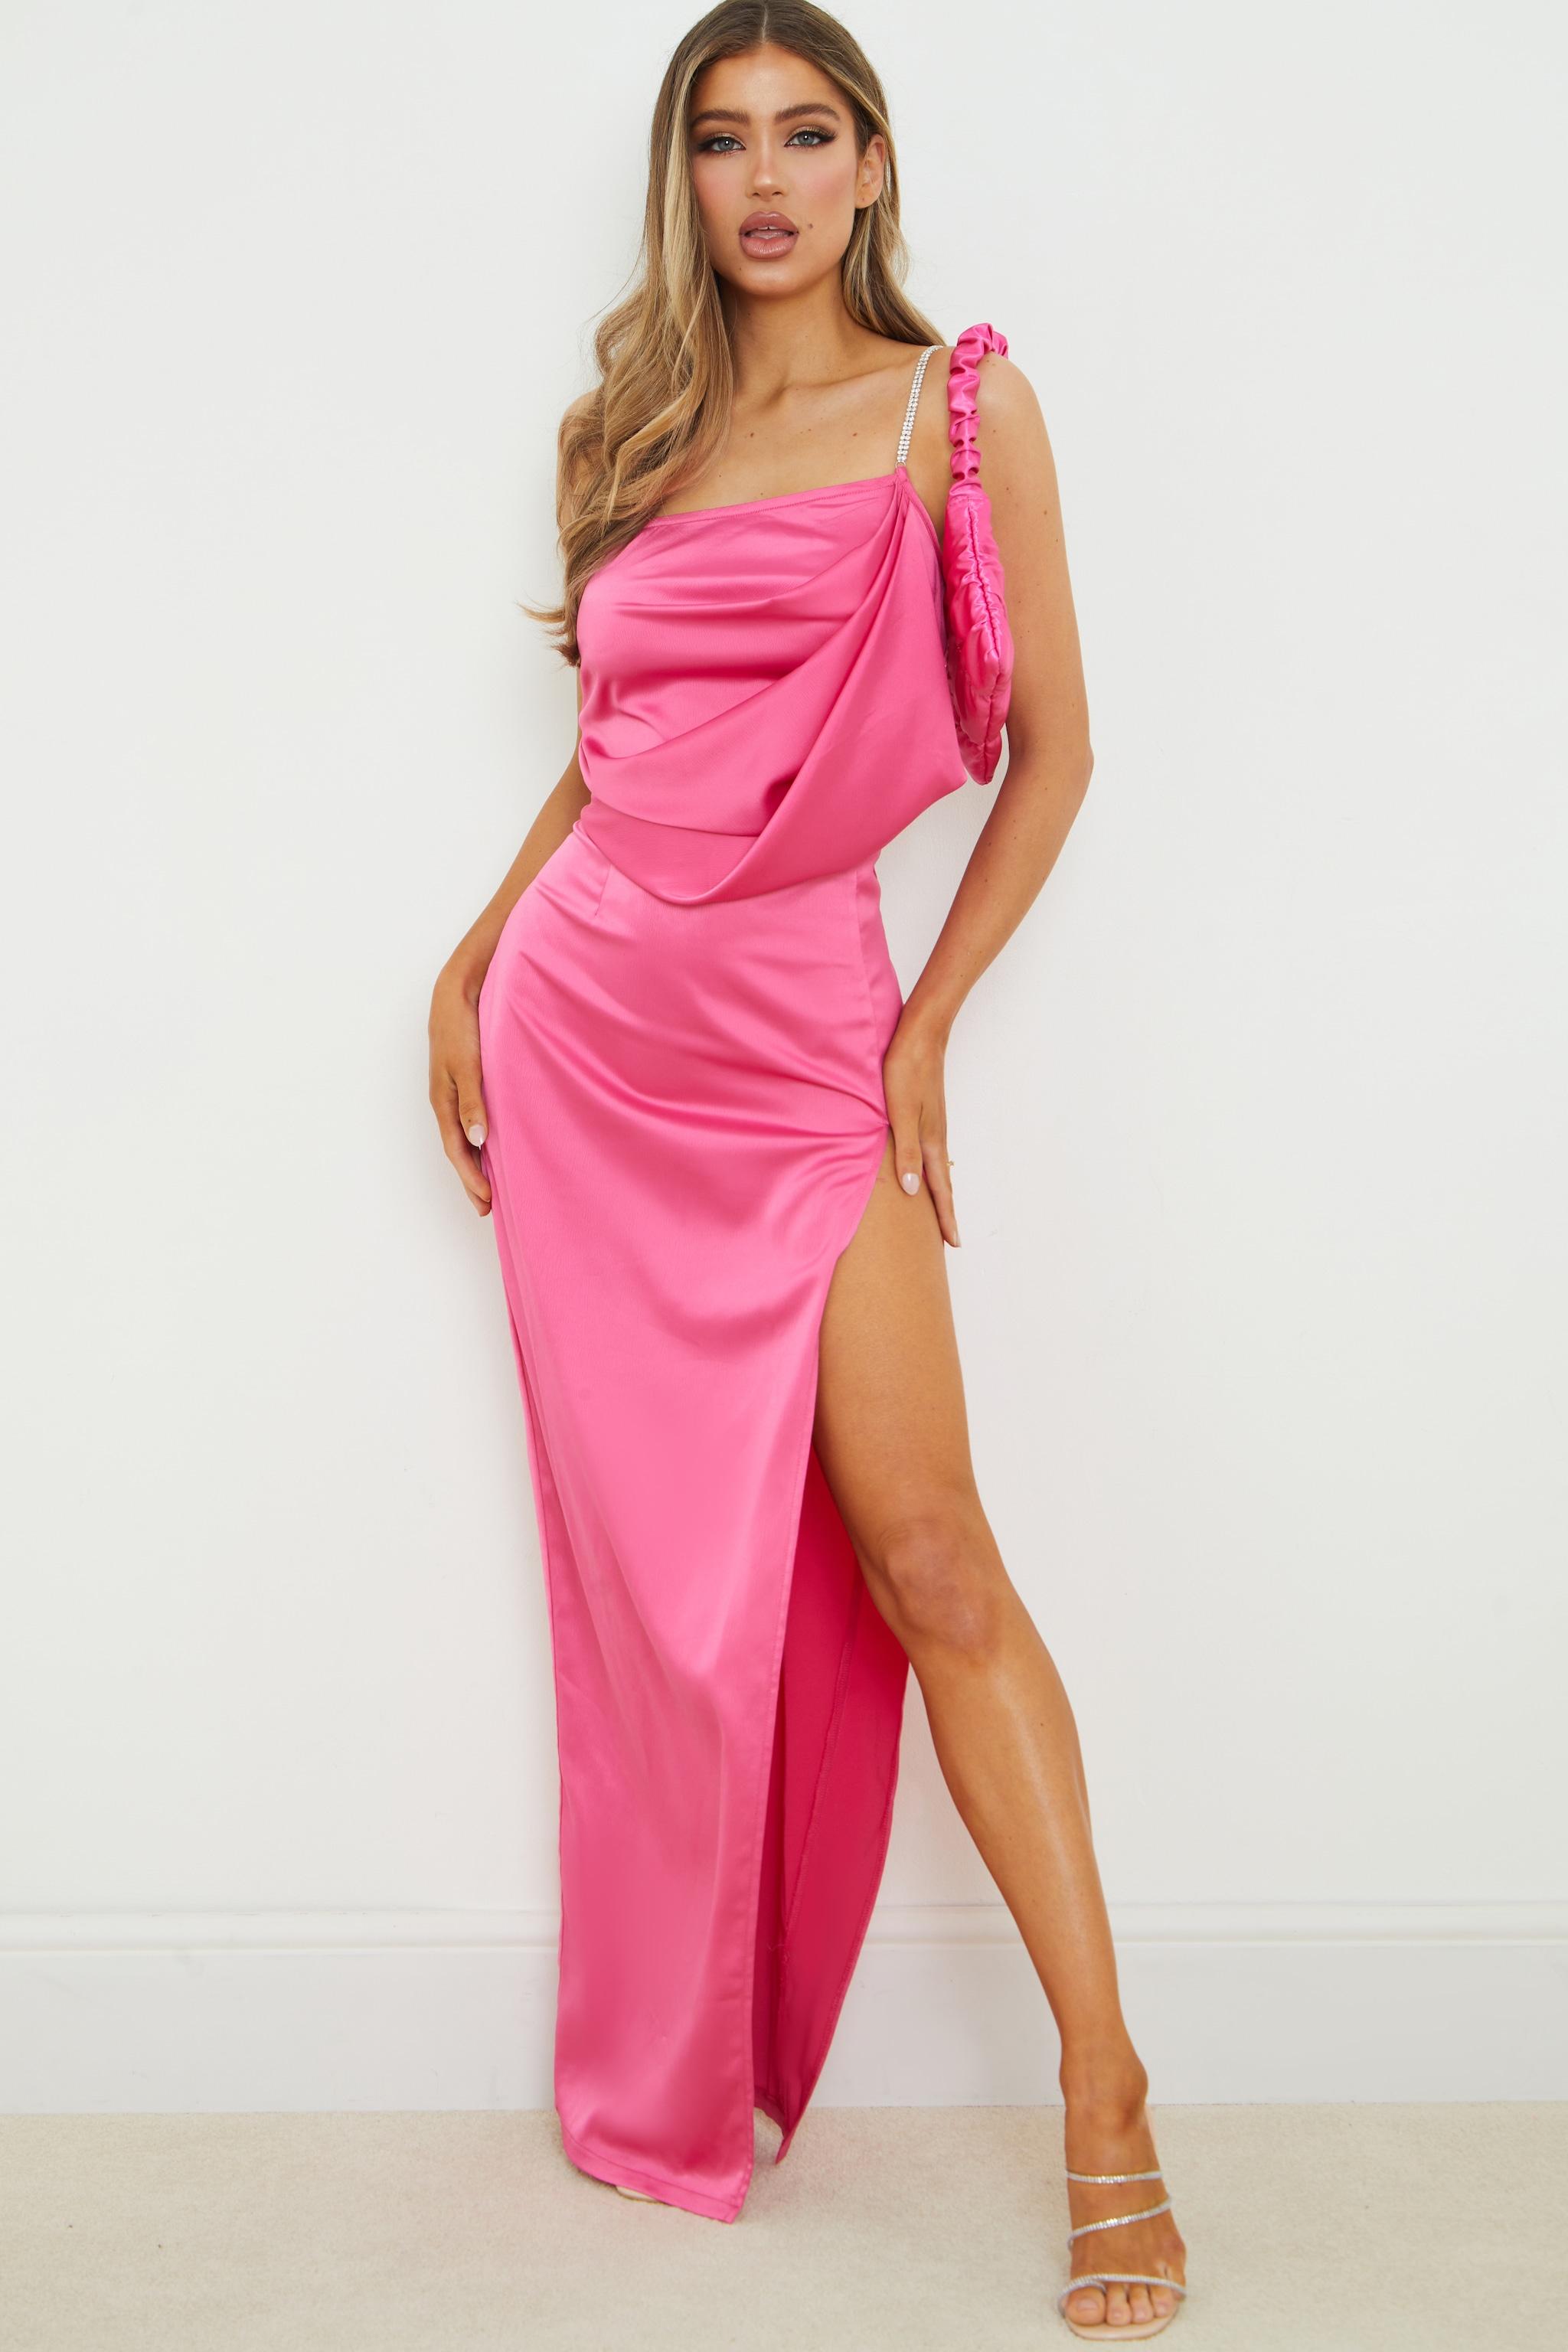 Hot Pink Satin Diamante One Shoulder Drape Maxi Dress 2